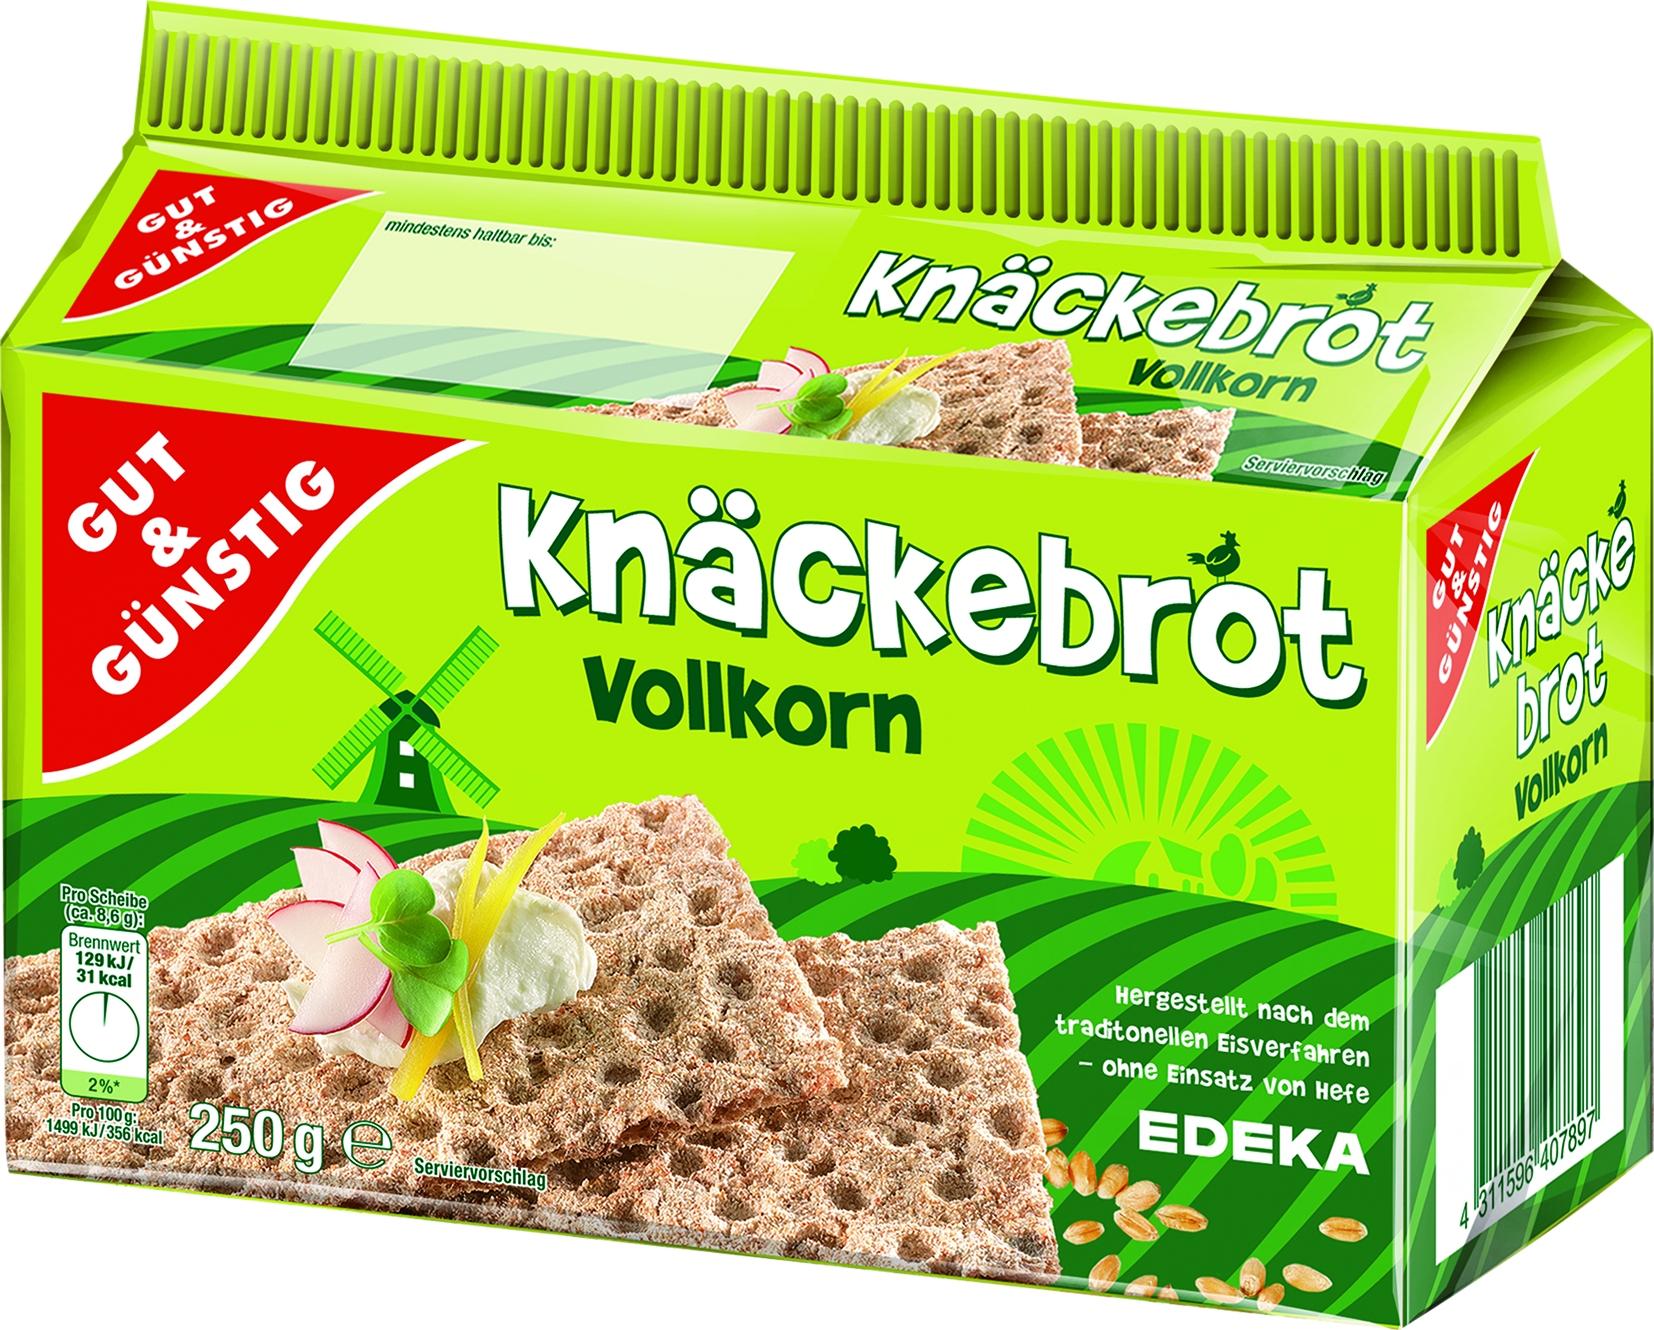 Knaeckebrot Vollkorn